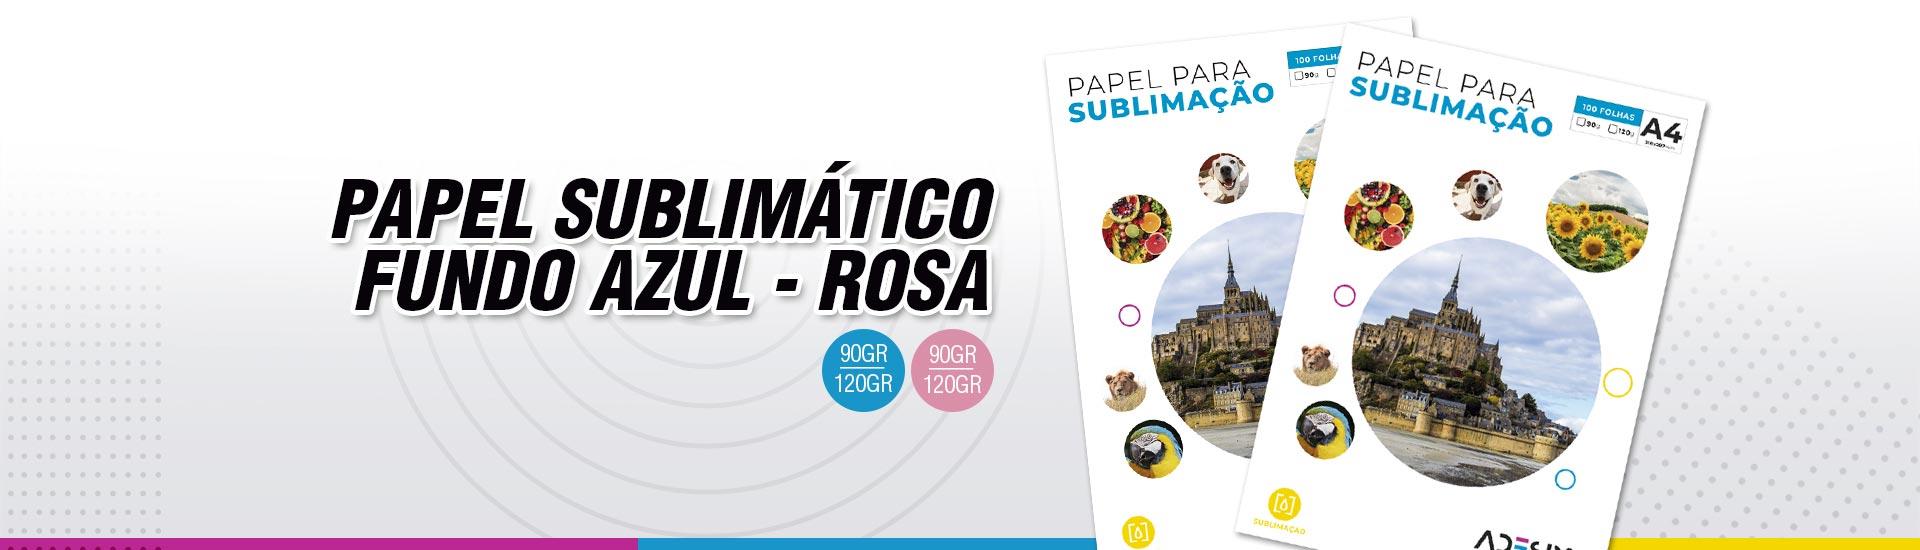 banner-sublimatico-01